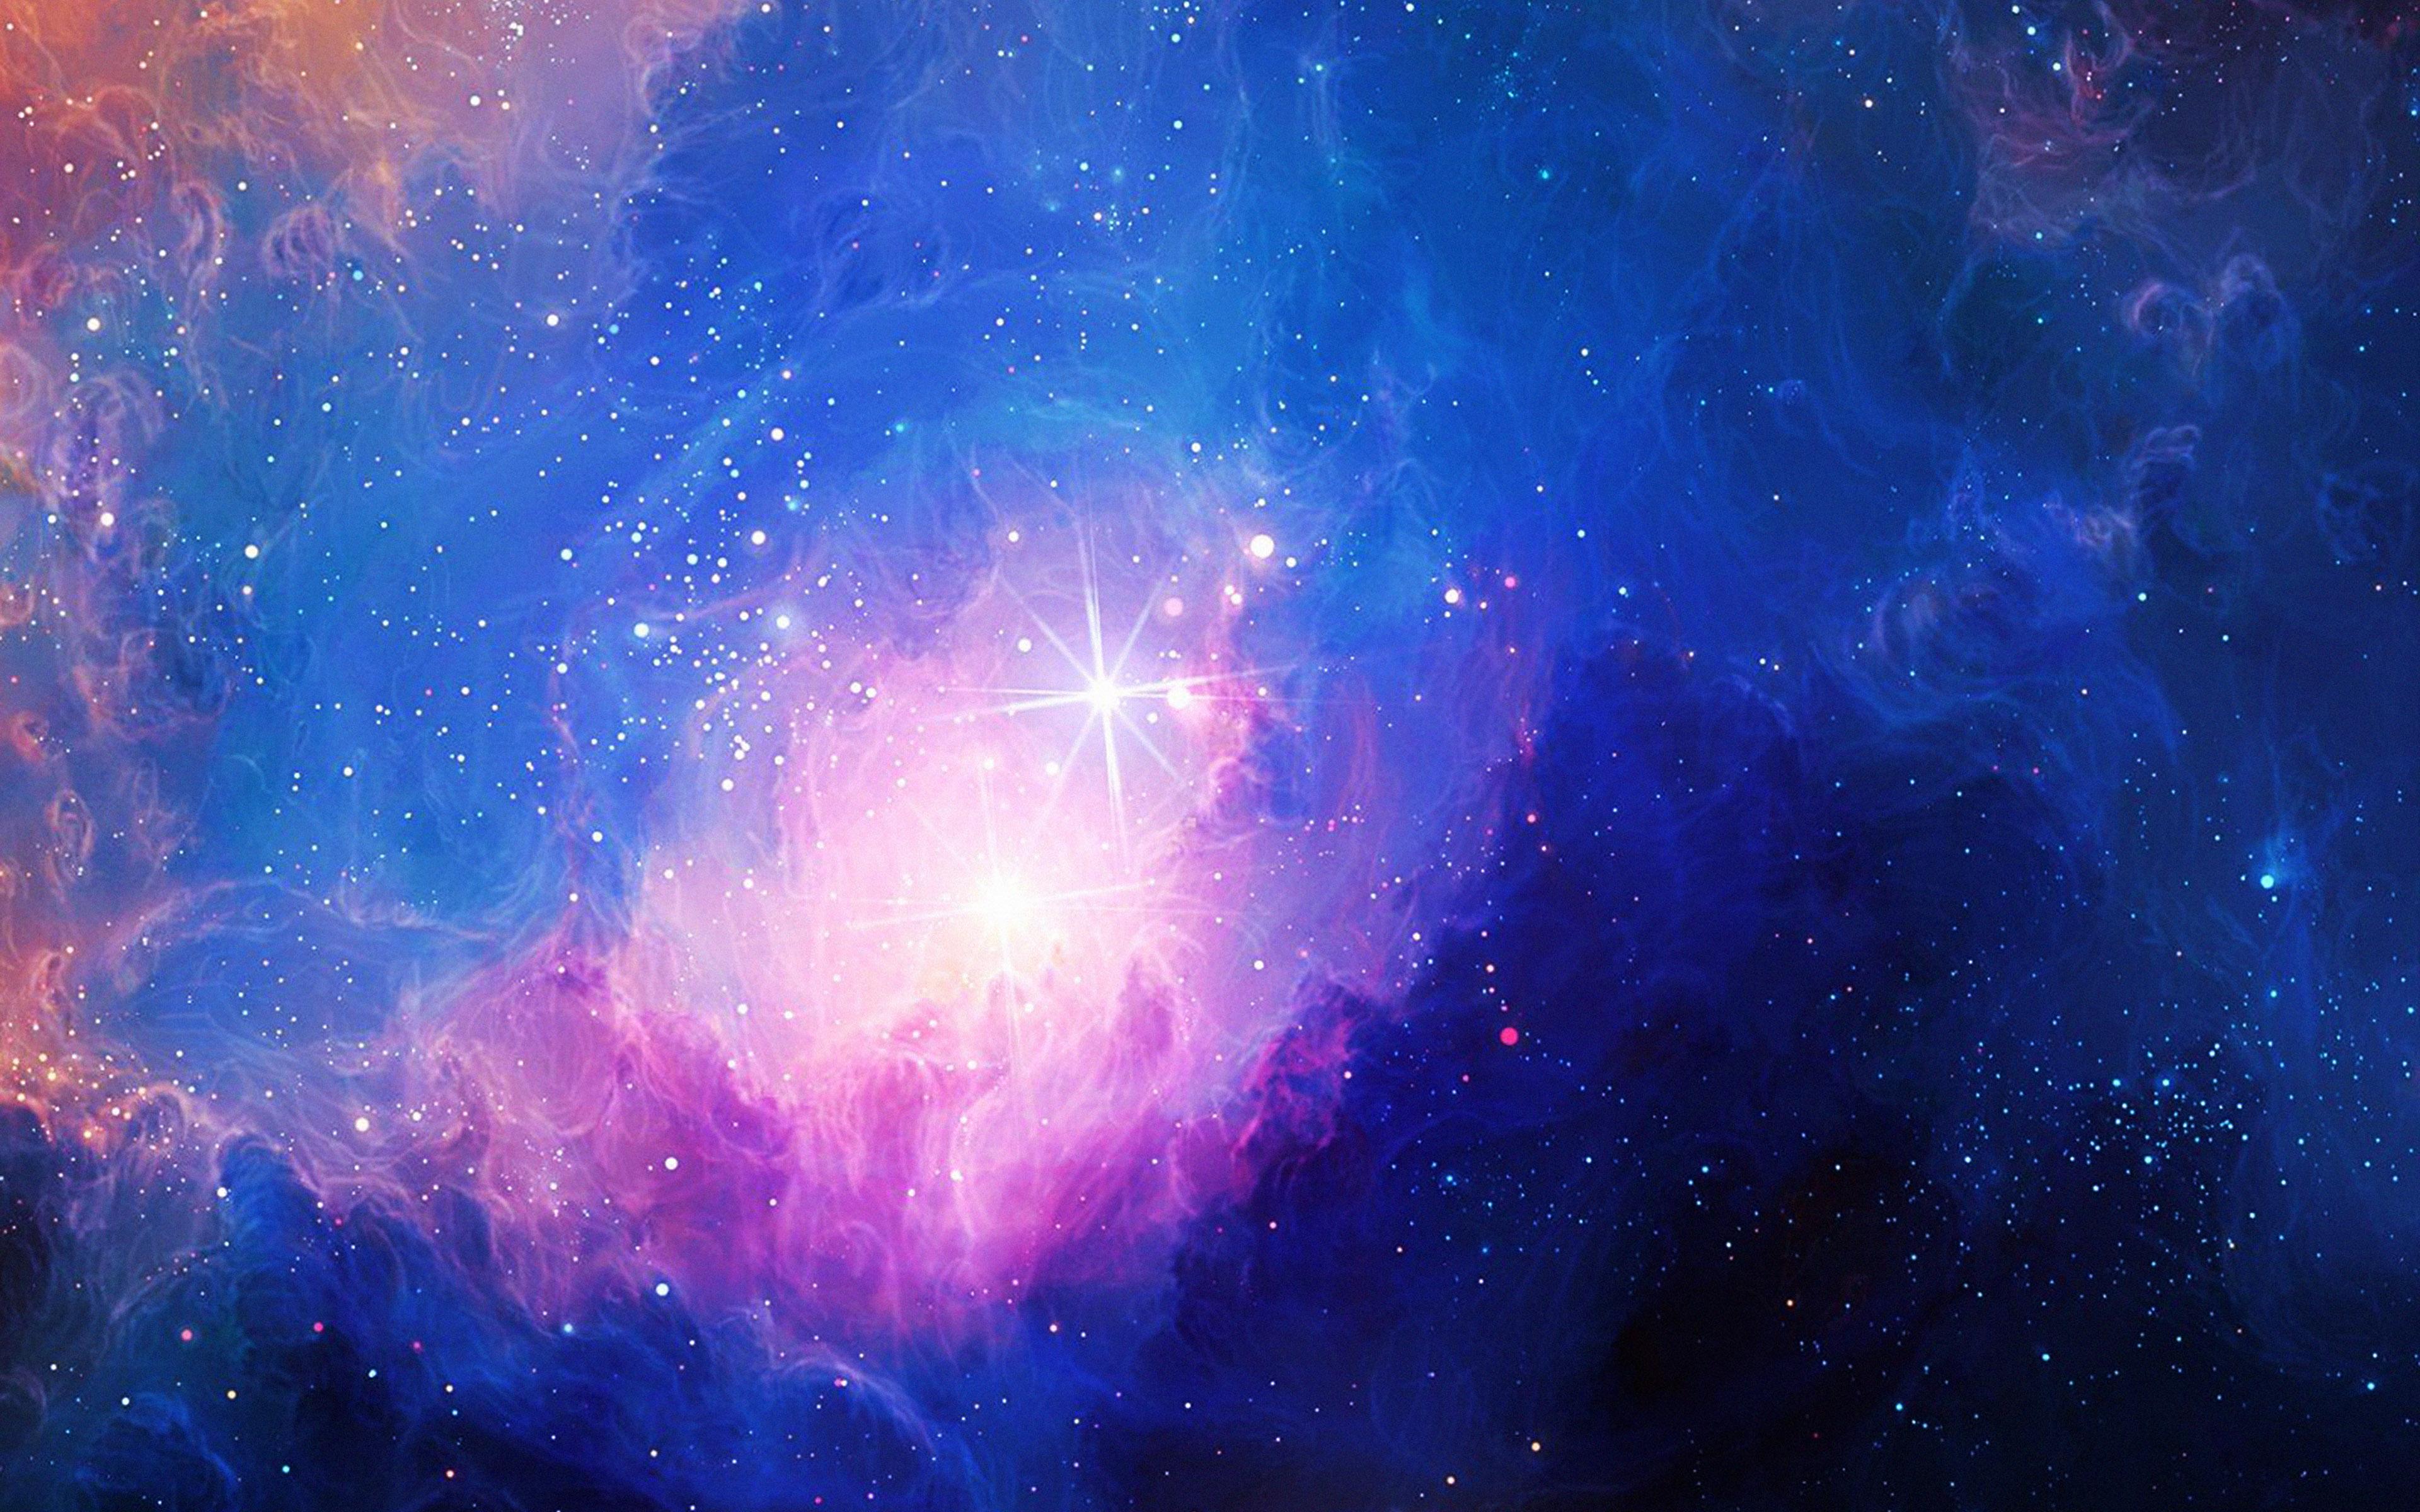 Fall Wallpaper 1440p Mn48 Space Aurora Art Star Illust Blue Rainbow Papers Co